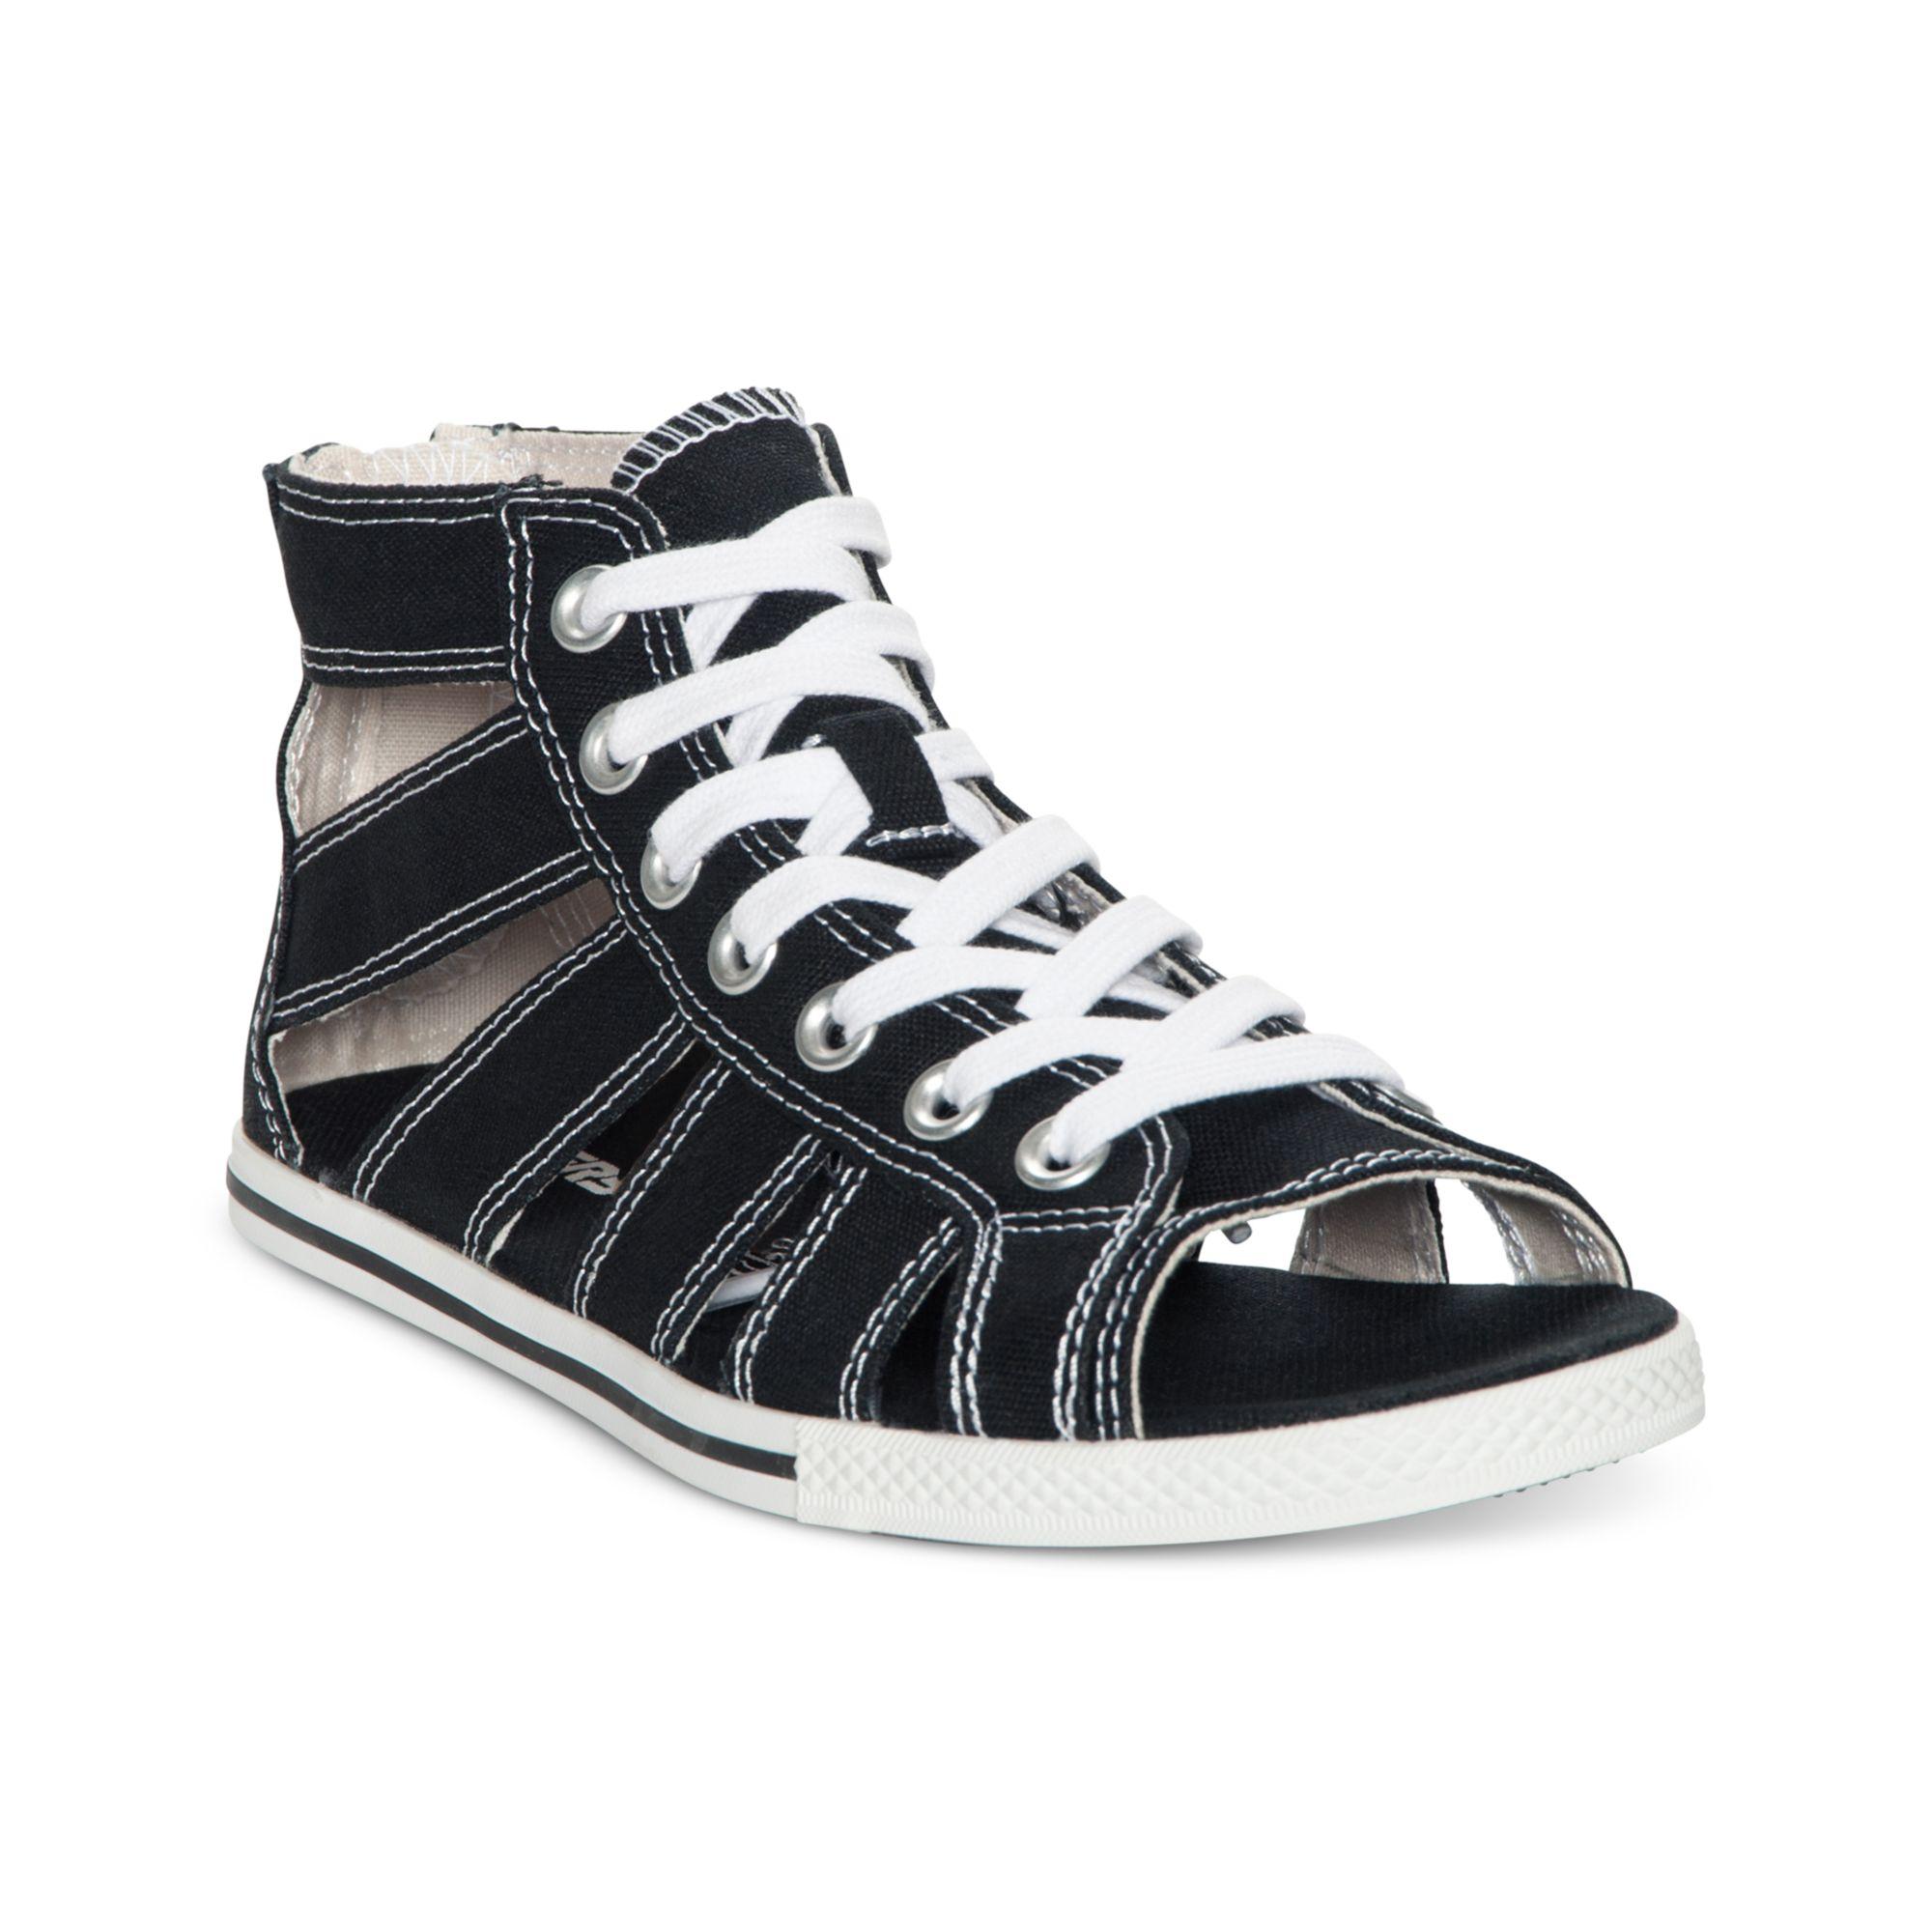 Lyst - Adidas Ultra Boost Wool Knit Running Sneakers in Black